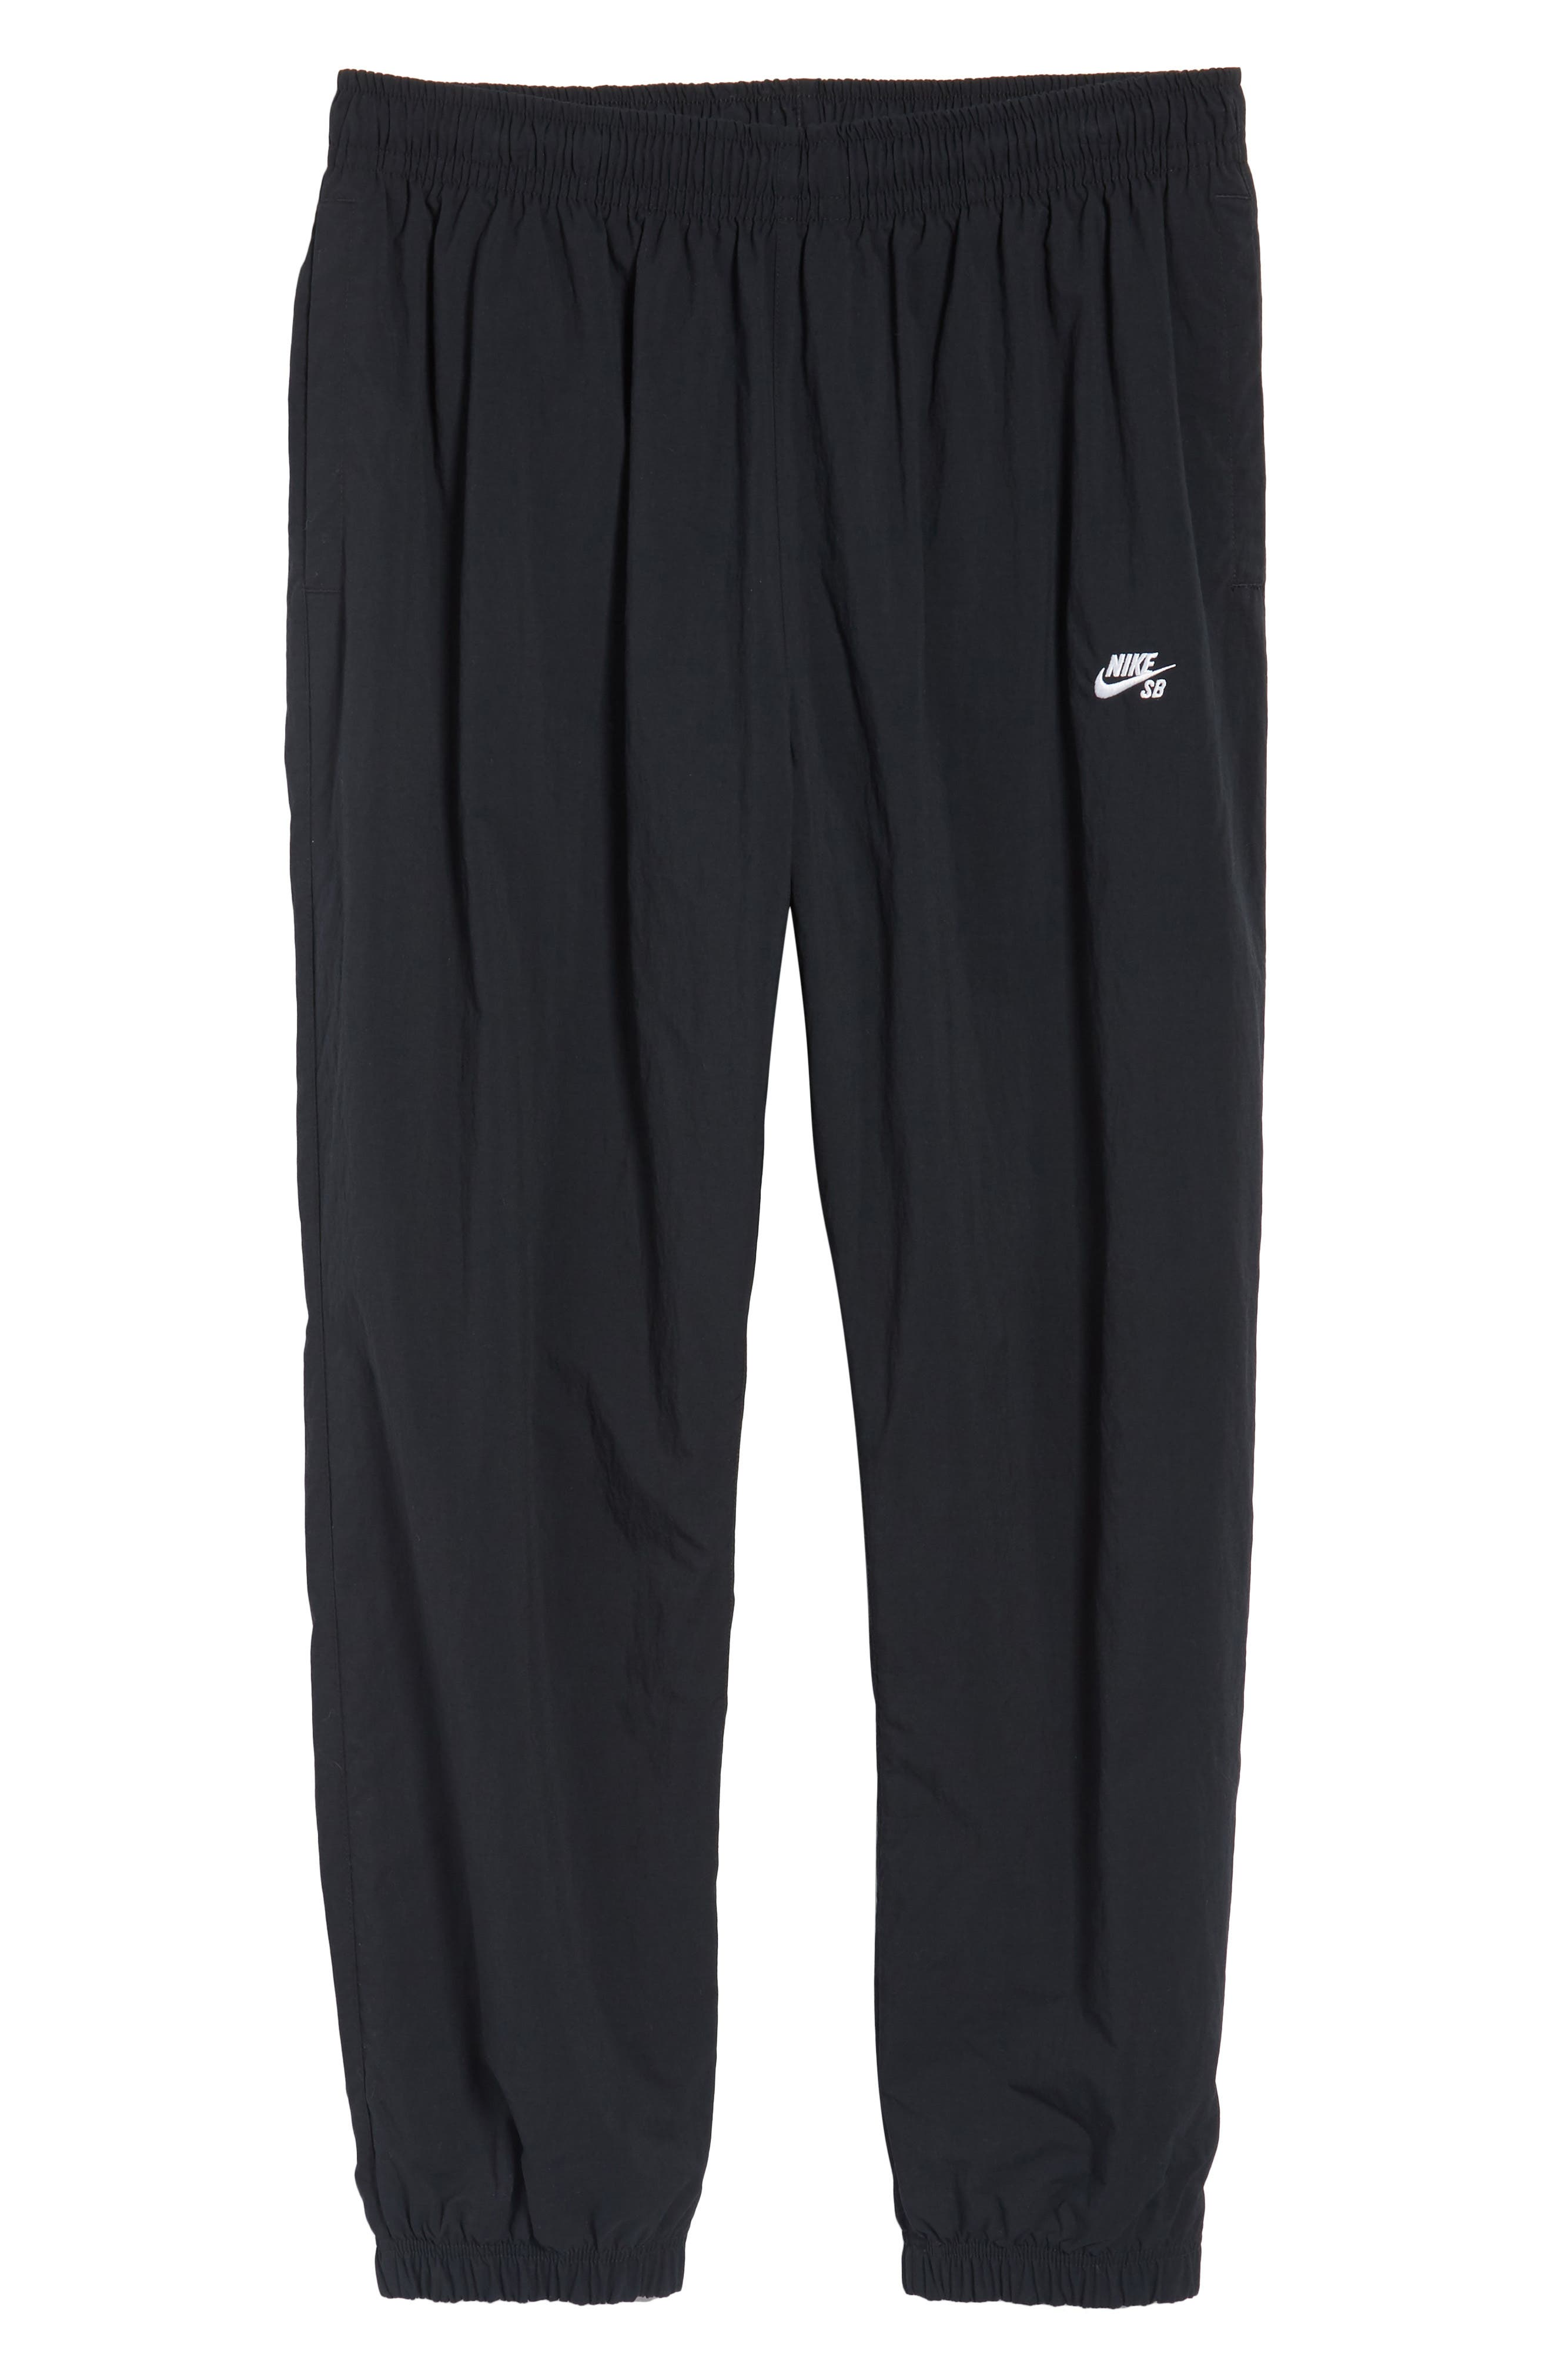 Flex Woven Pants,                             Alternate thumbnail 6, color,                             010